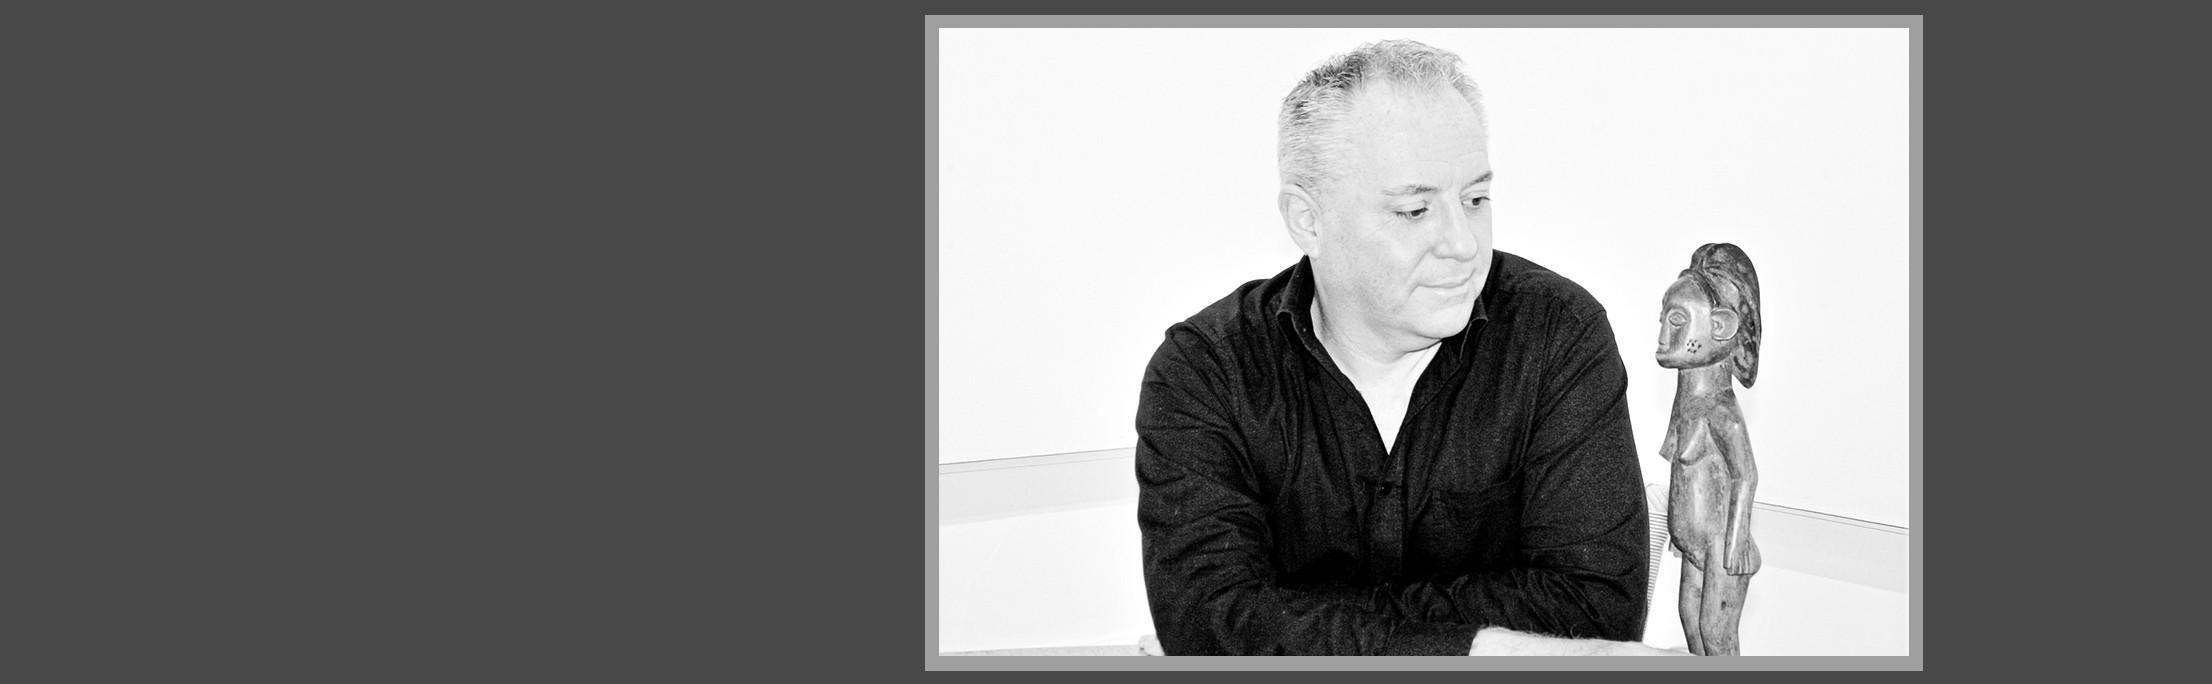 Bretland Gaunt - Expertise Art Africain Primitif Premier